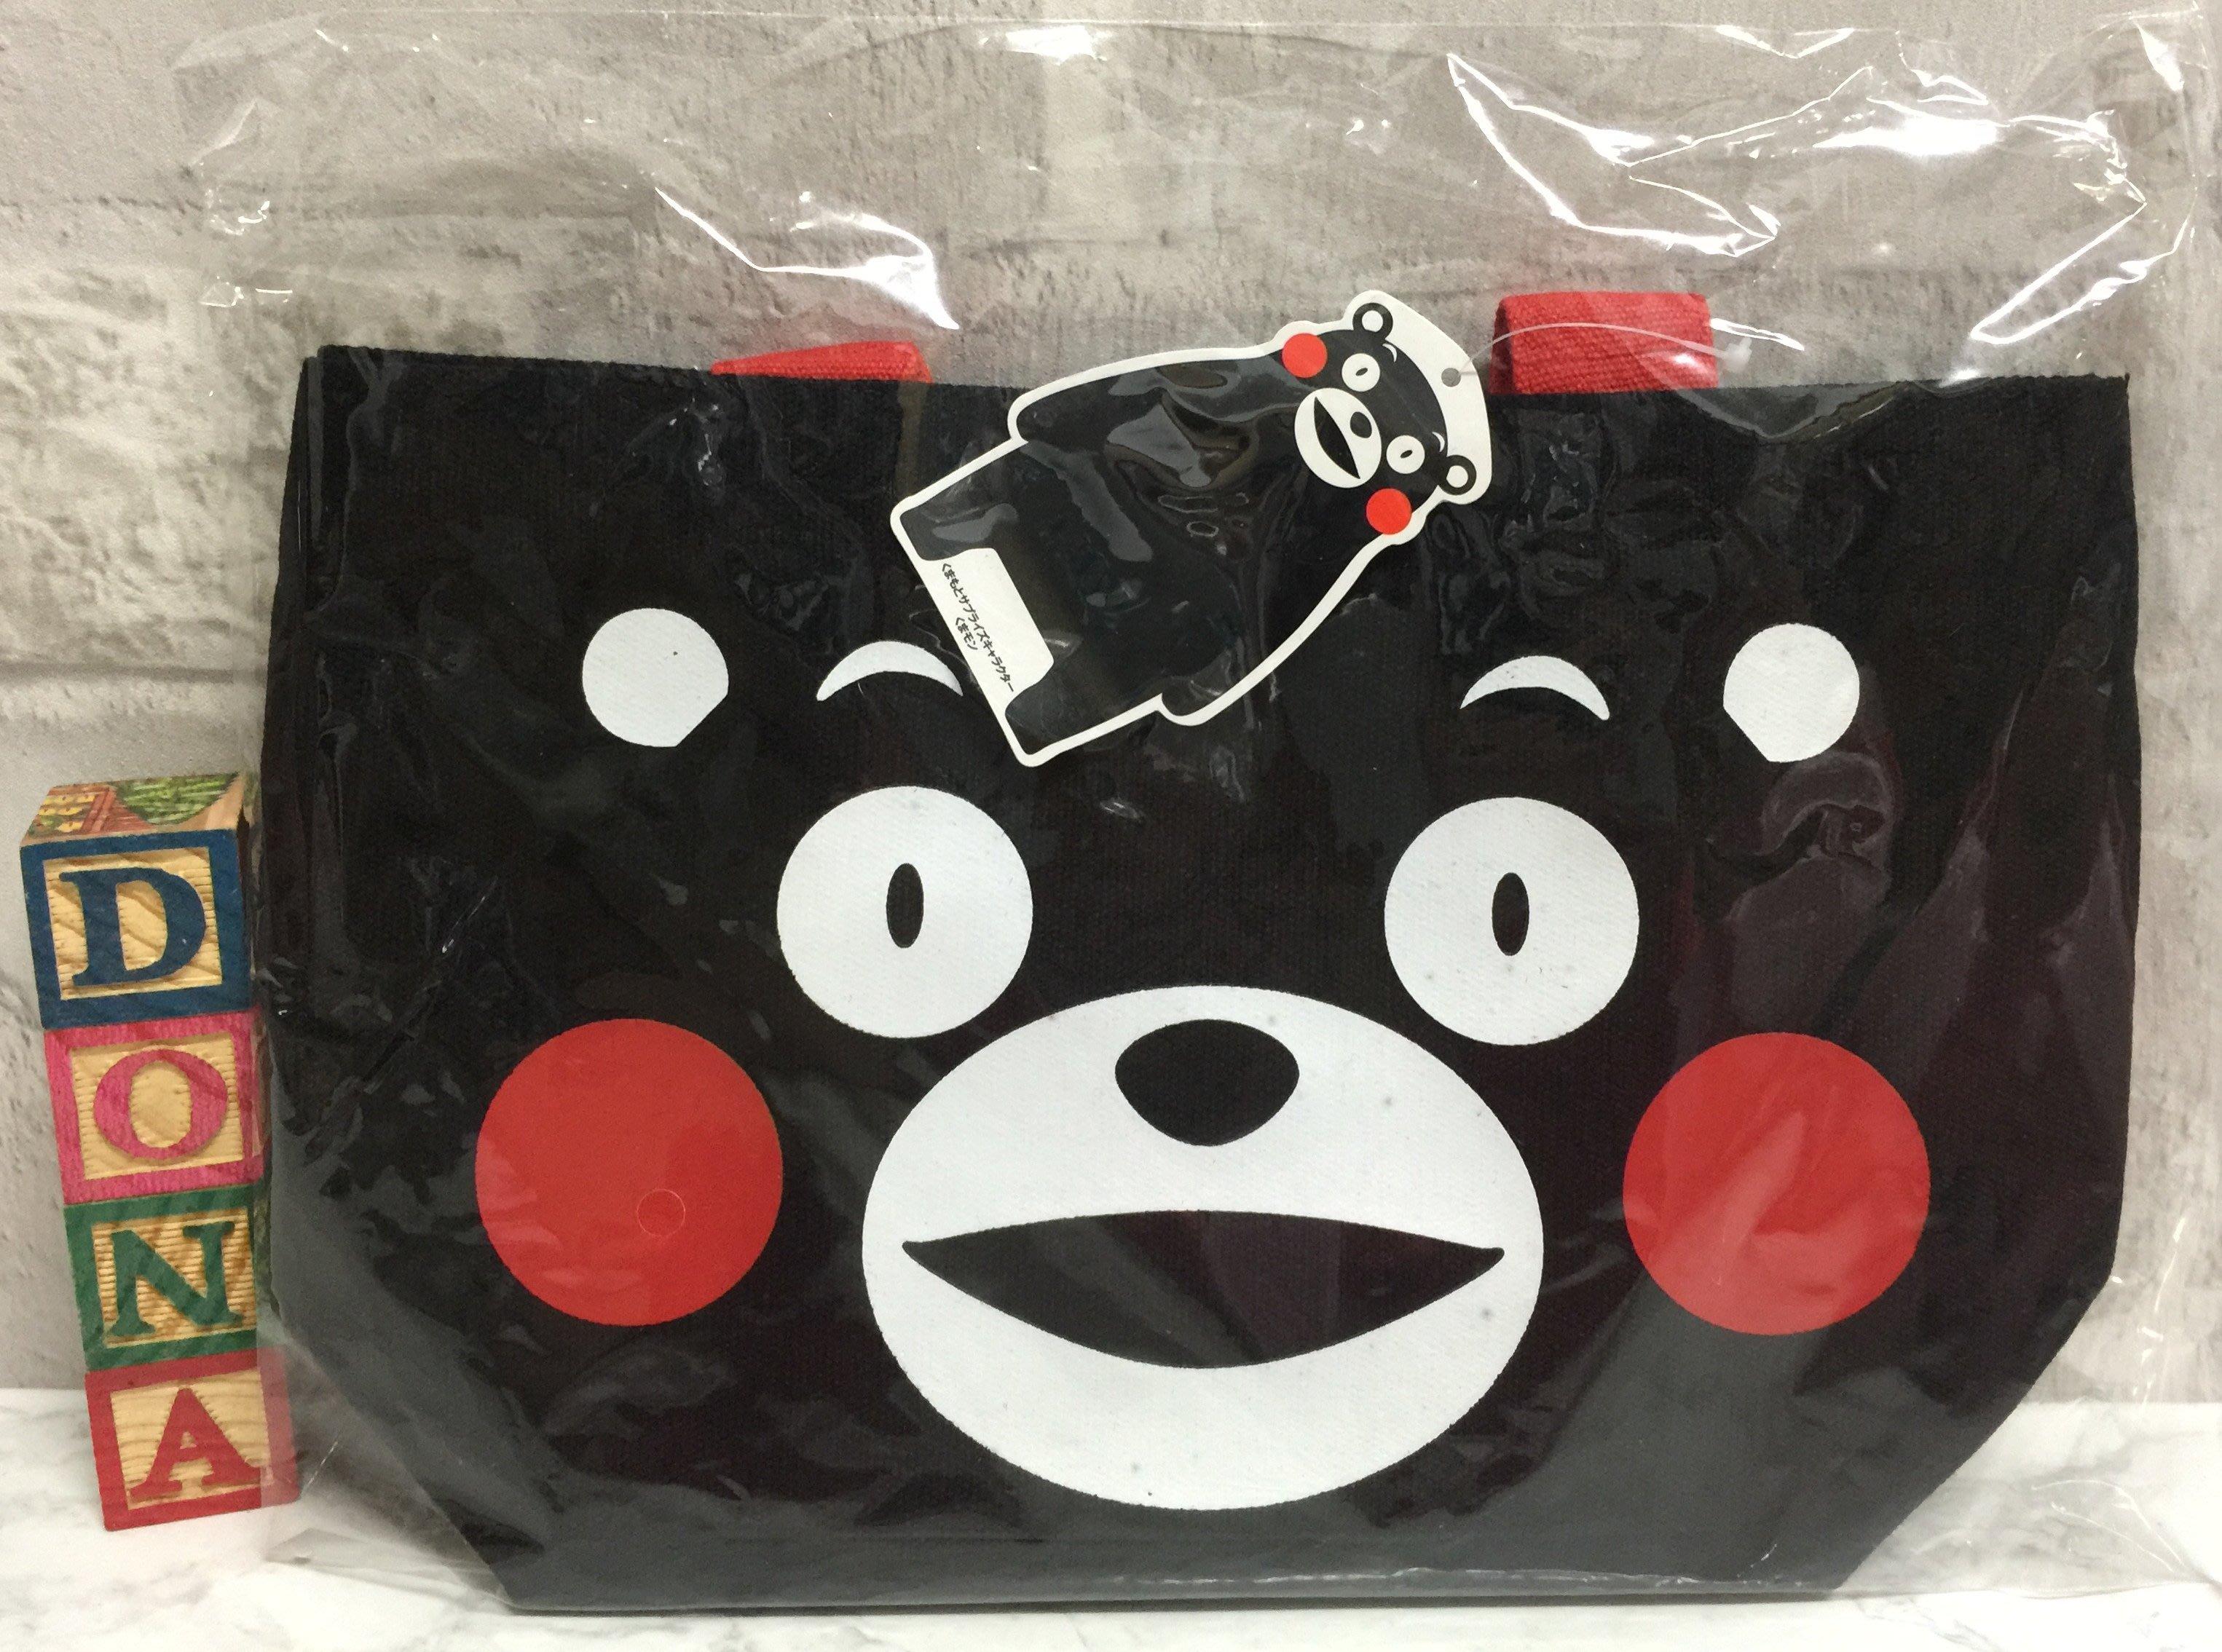 【Dona日貨】日本正版 熊本熊Kumamon熊萌微笑歡樂表情 環保袋/購物袋/手提袋 B25